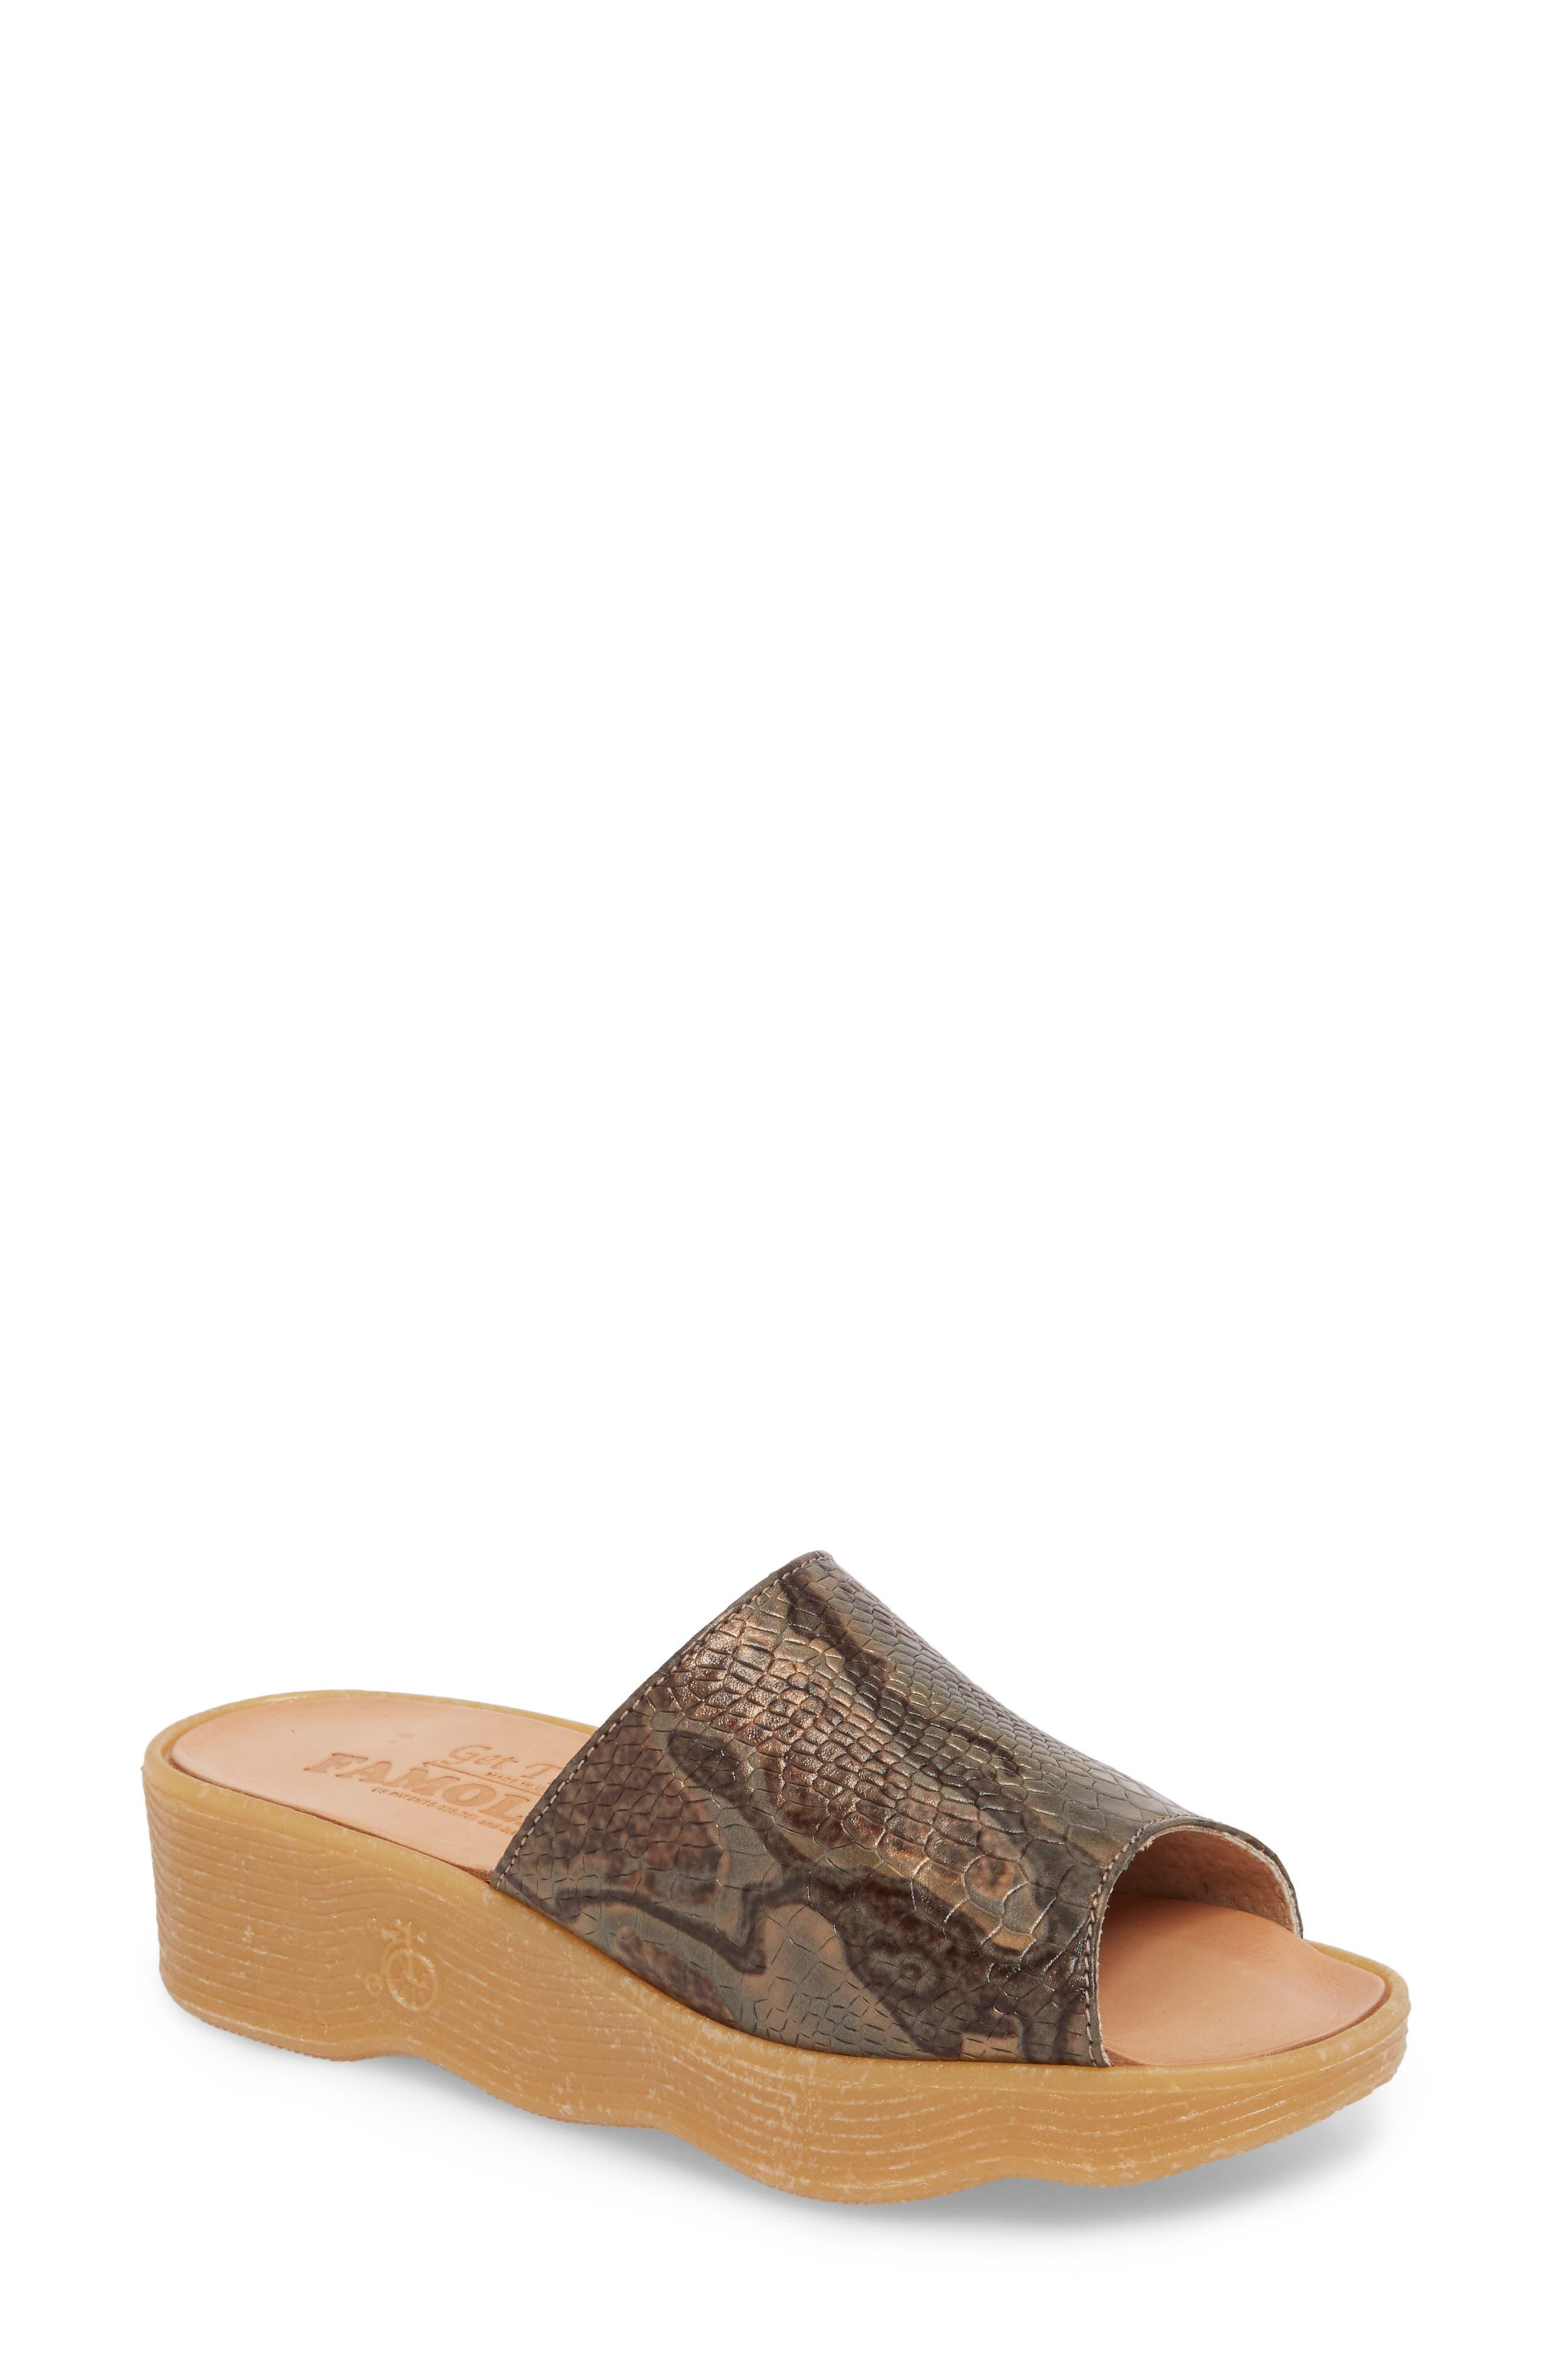 Slide N Sleek Wedge Slide Sandal,                         Main,                         color, Snake Leather